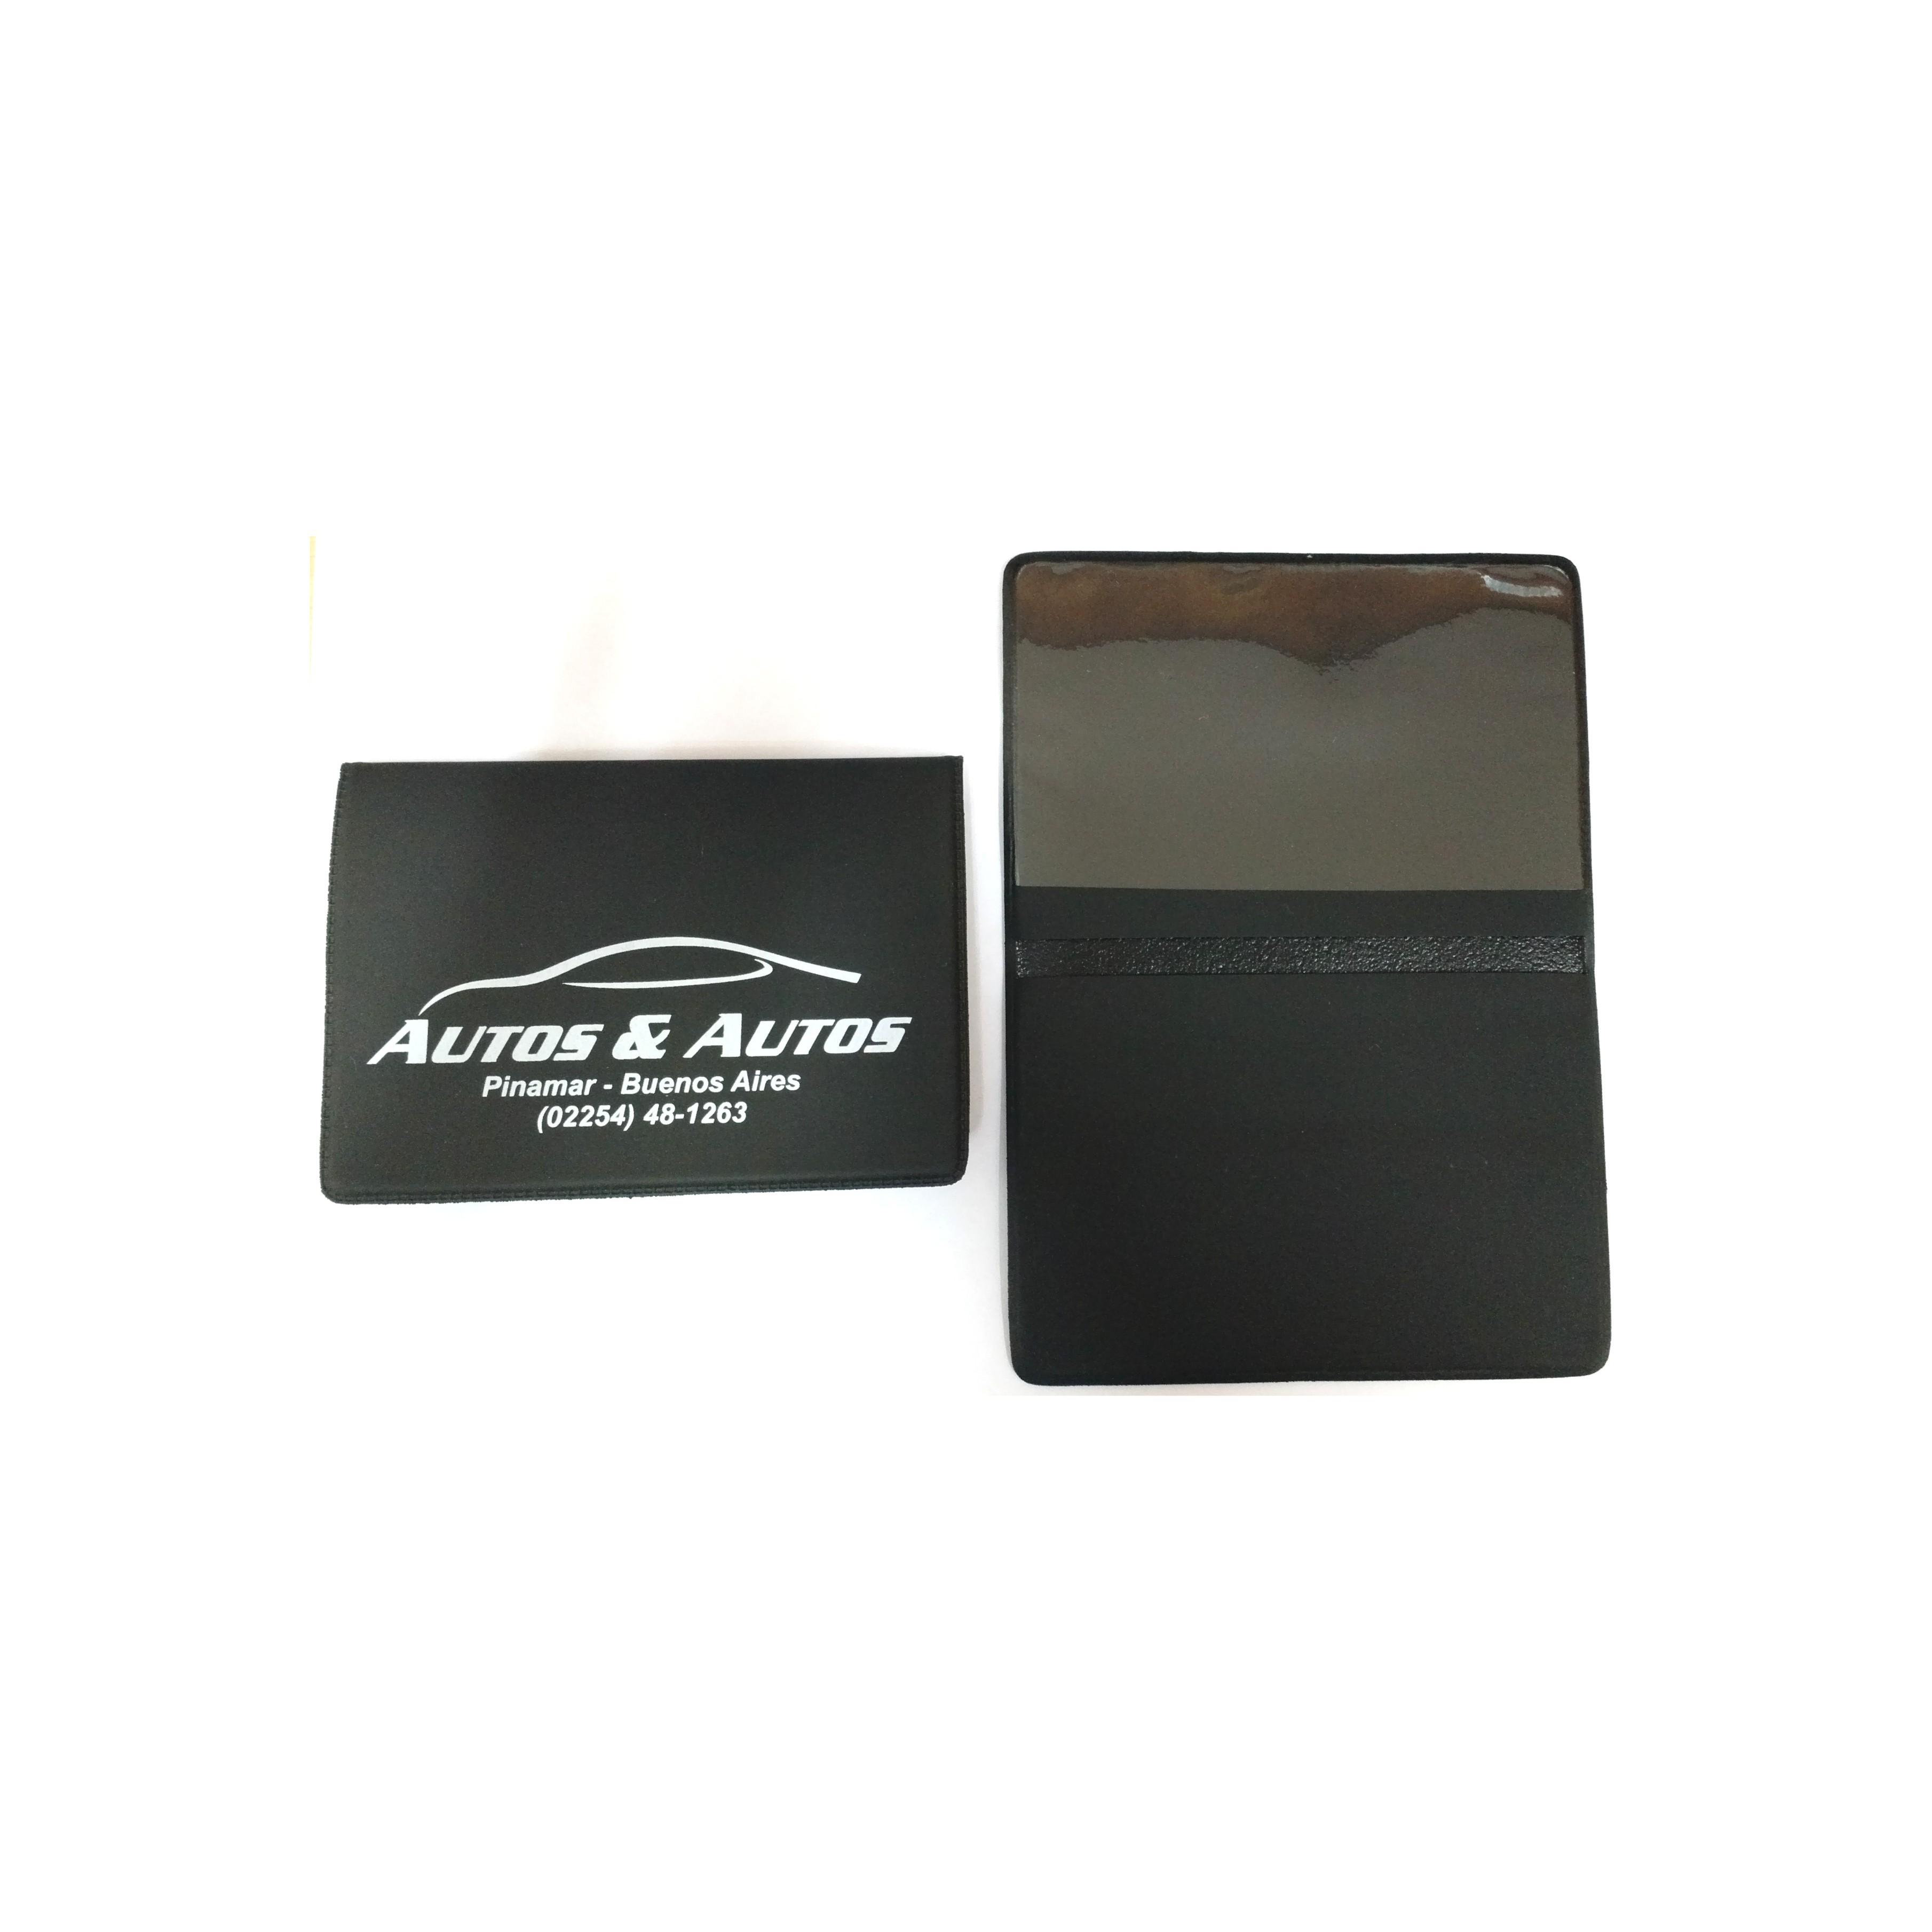 Portadocumento de bolsillo – Art 255d (2)